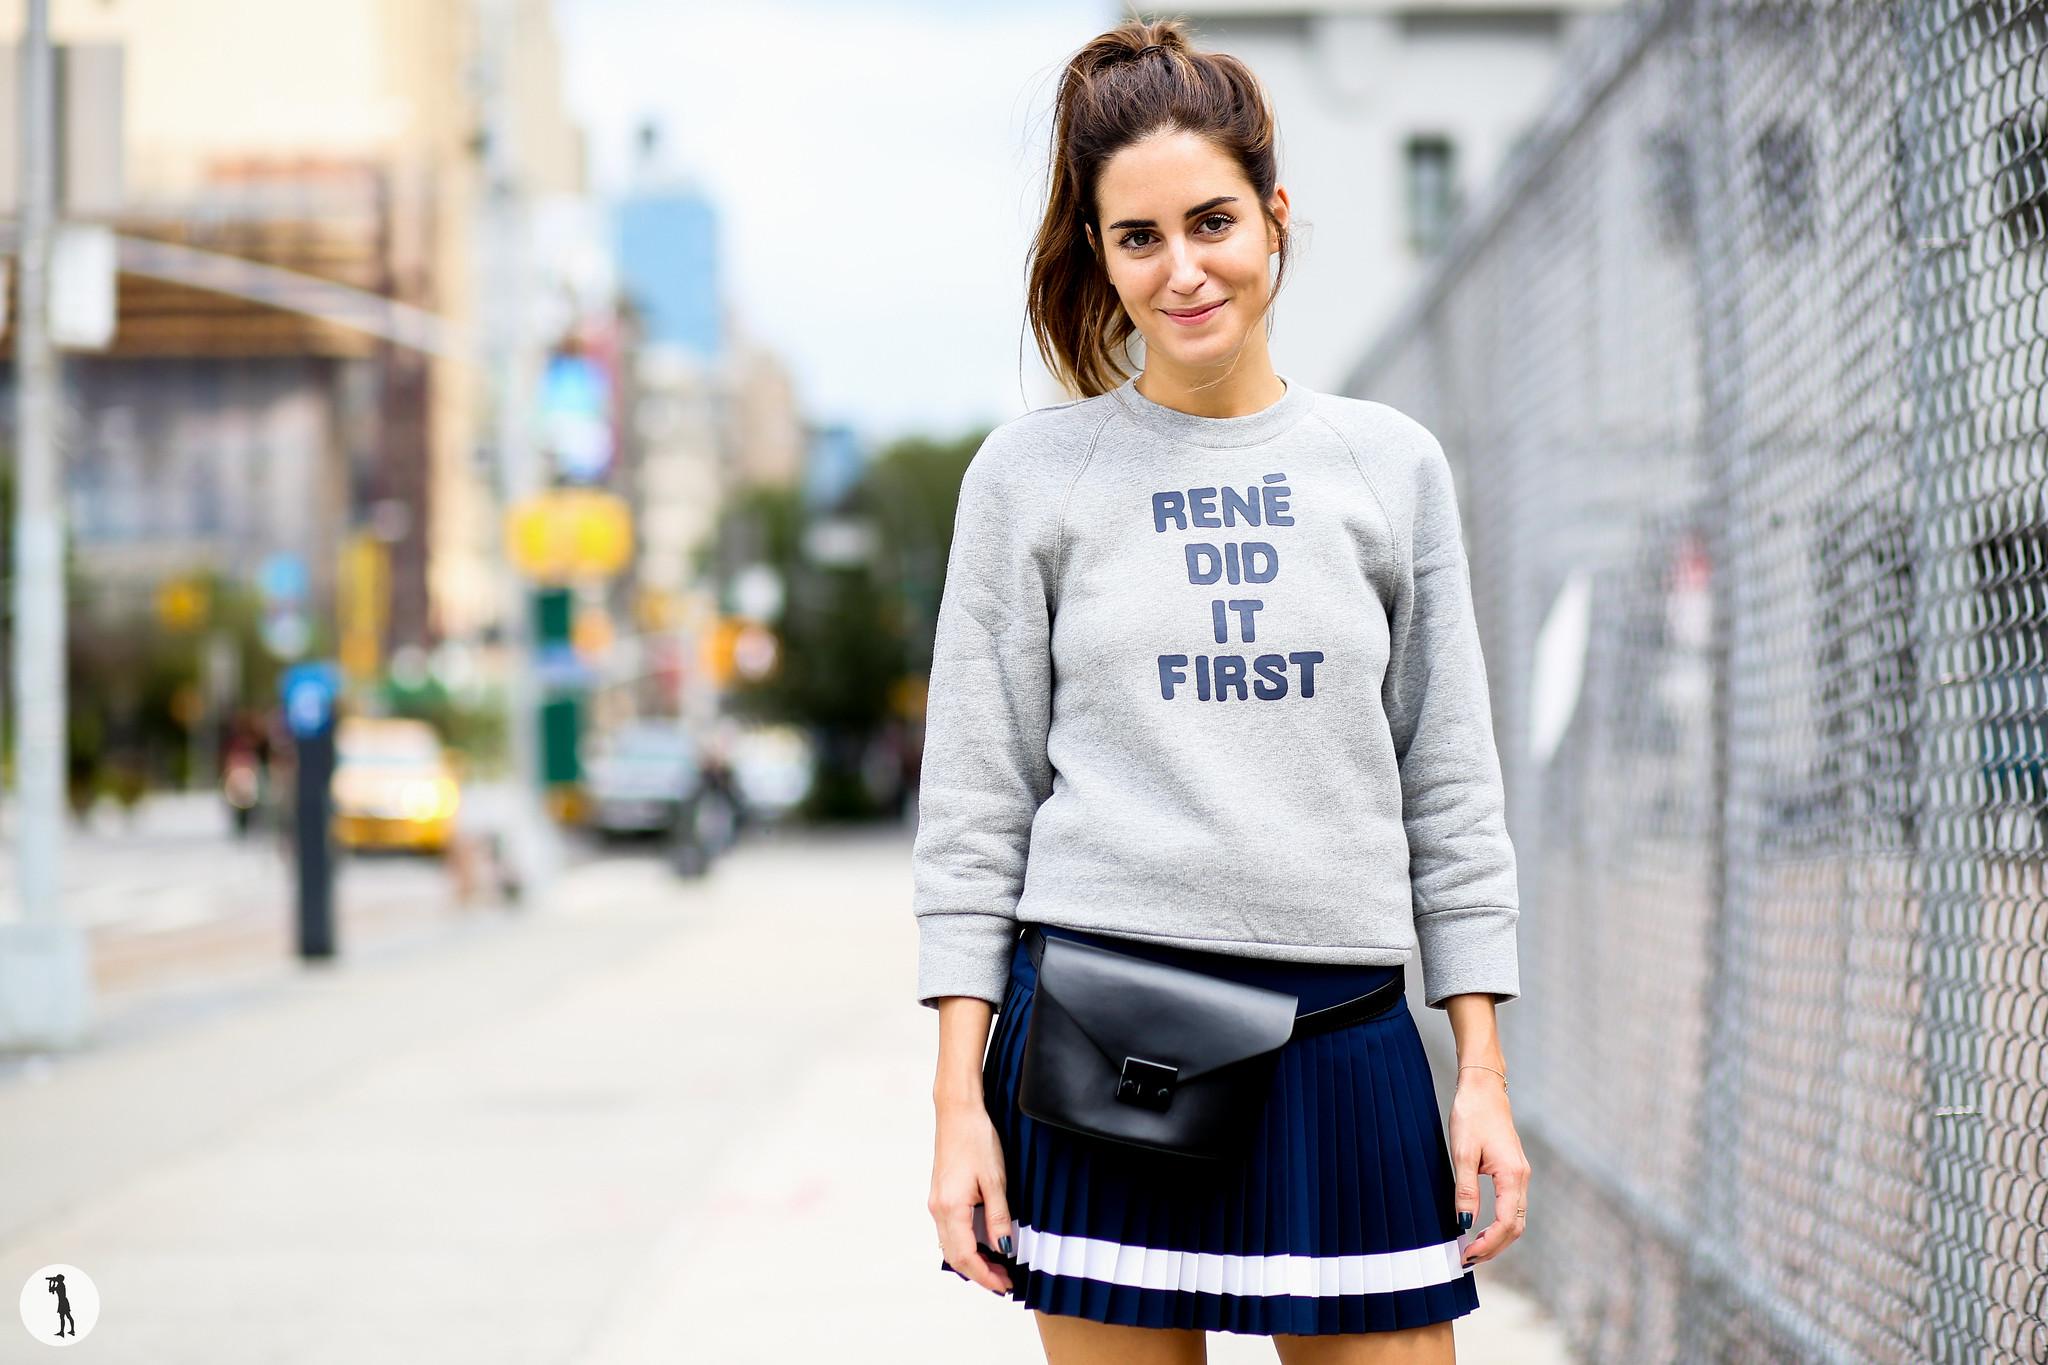 Gala Gonzalez at New York Fashion Week-3 2